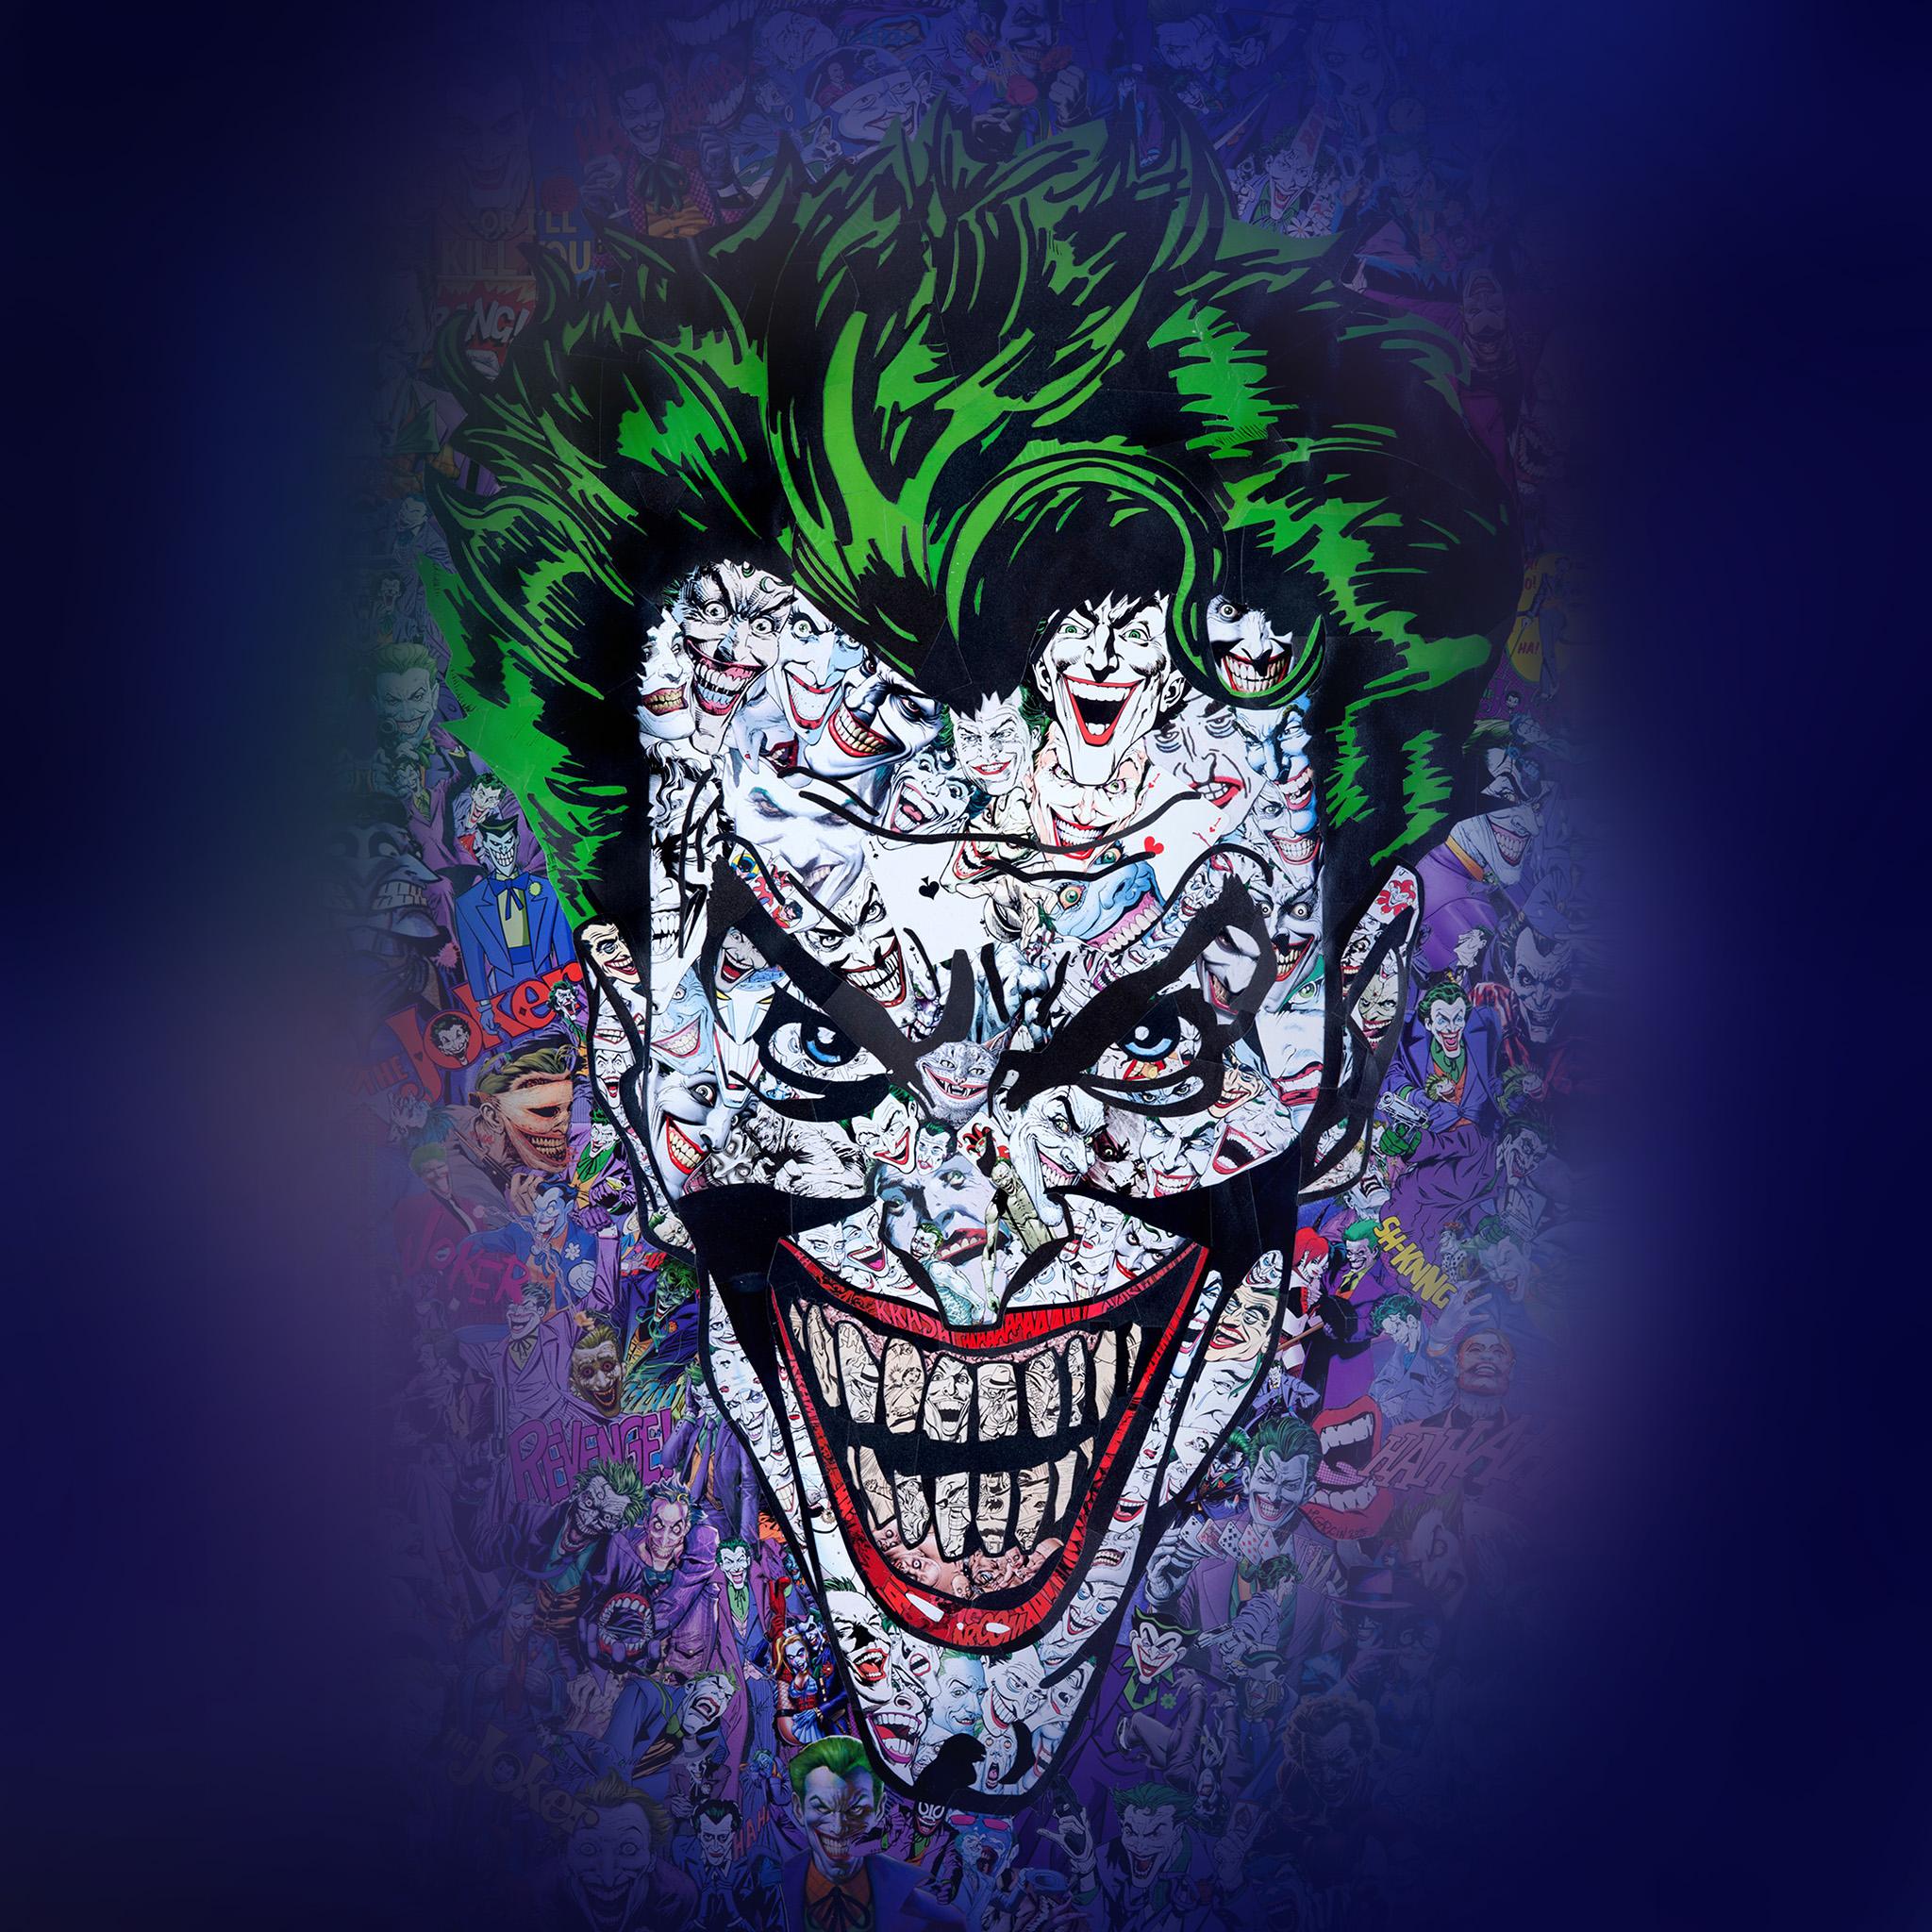 Au55-joker-art-face-illustration-art-wallpaper